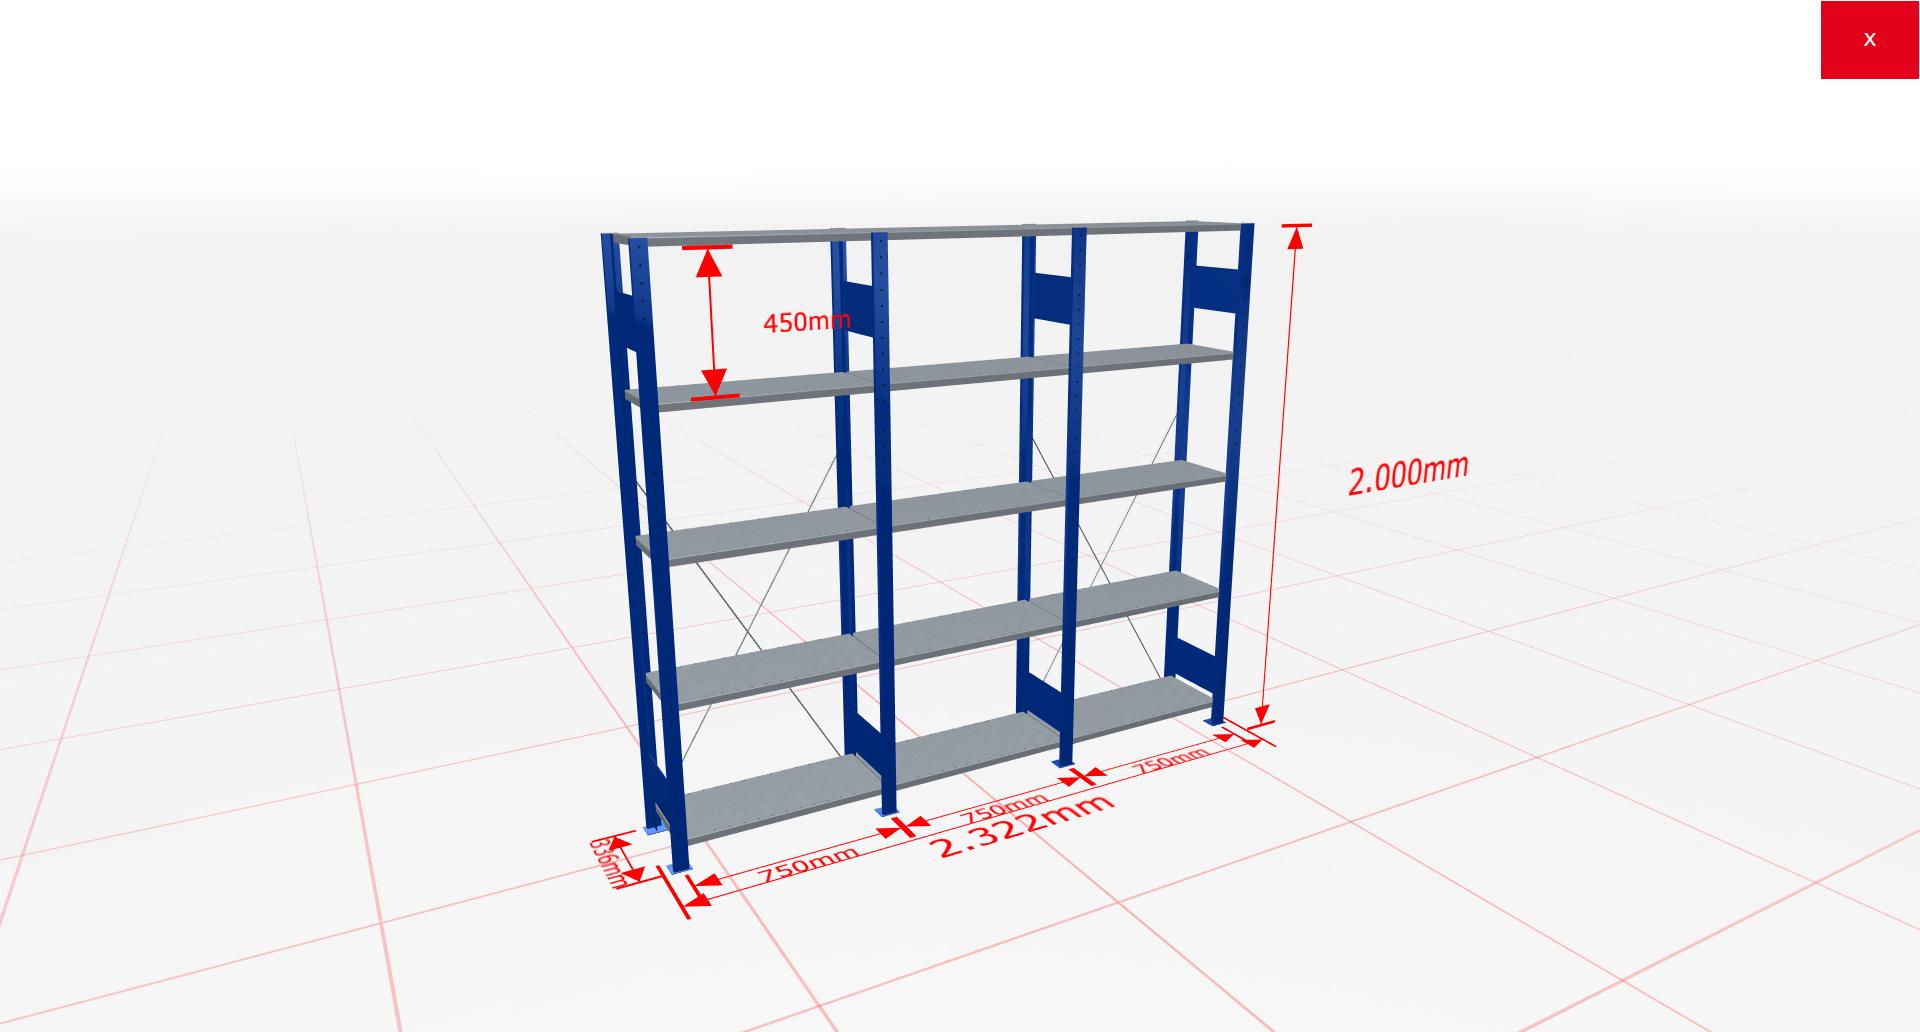 Fachbodenregal Komplettregal 2000x2322x300 mm (HxBxT) SCHULTE Lagertechnik blau 5 Ebenen  150 kg je Boden